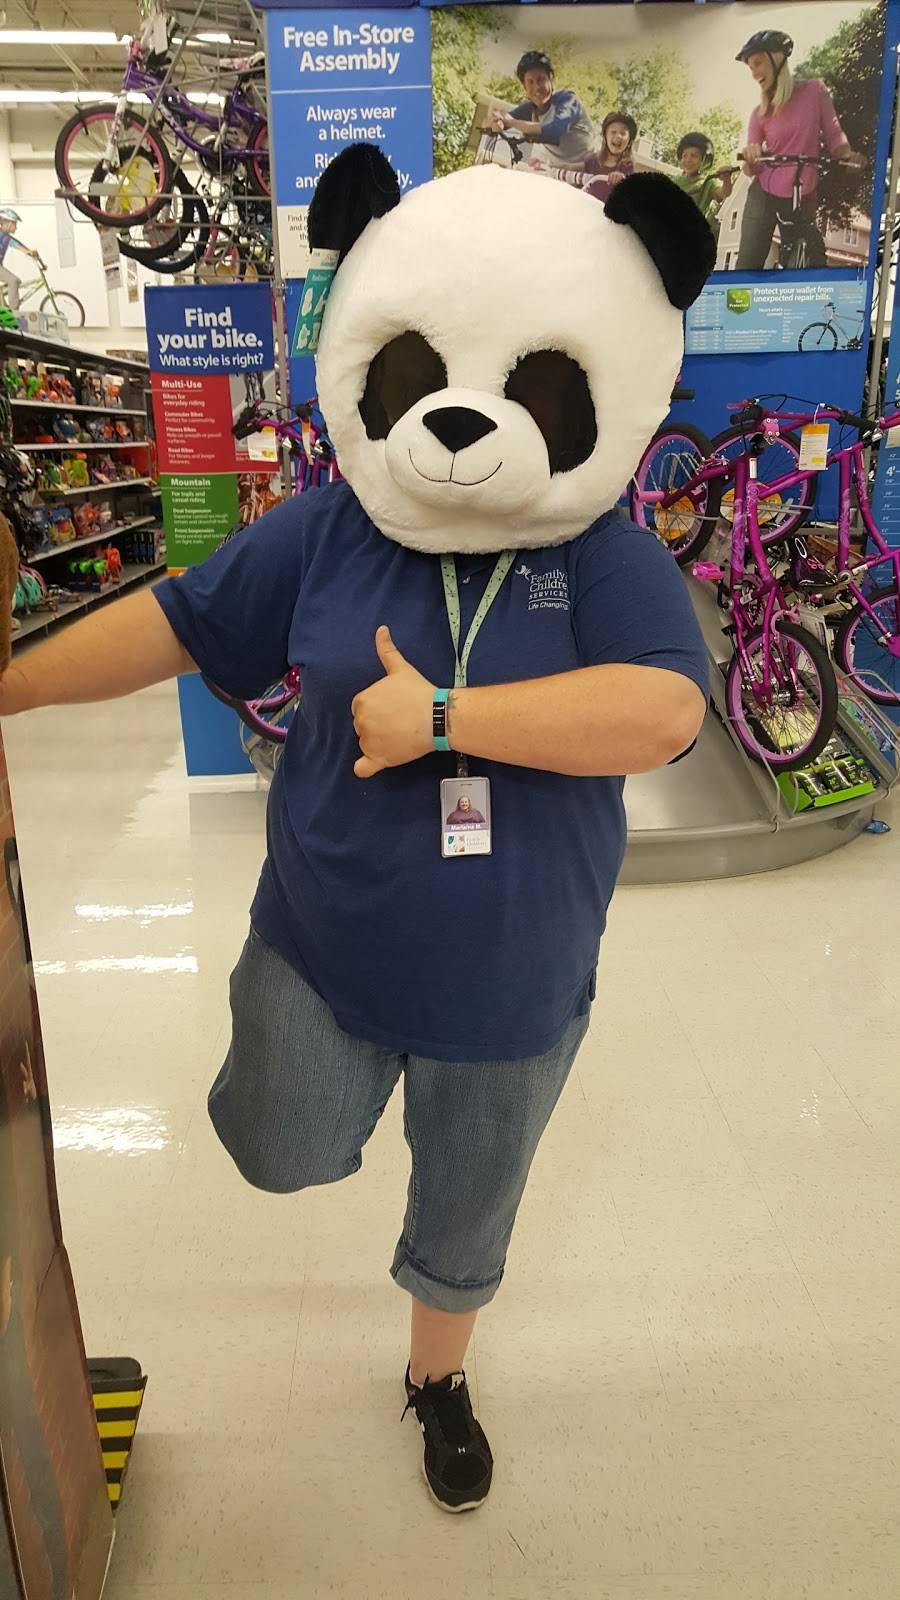 Walmart Supercenter - department store  | Photo 8 of 9 | Address: 207 S Memorial Dr, Tulsa, OK 74112, USA | Phone: (918) 834-8700